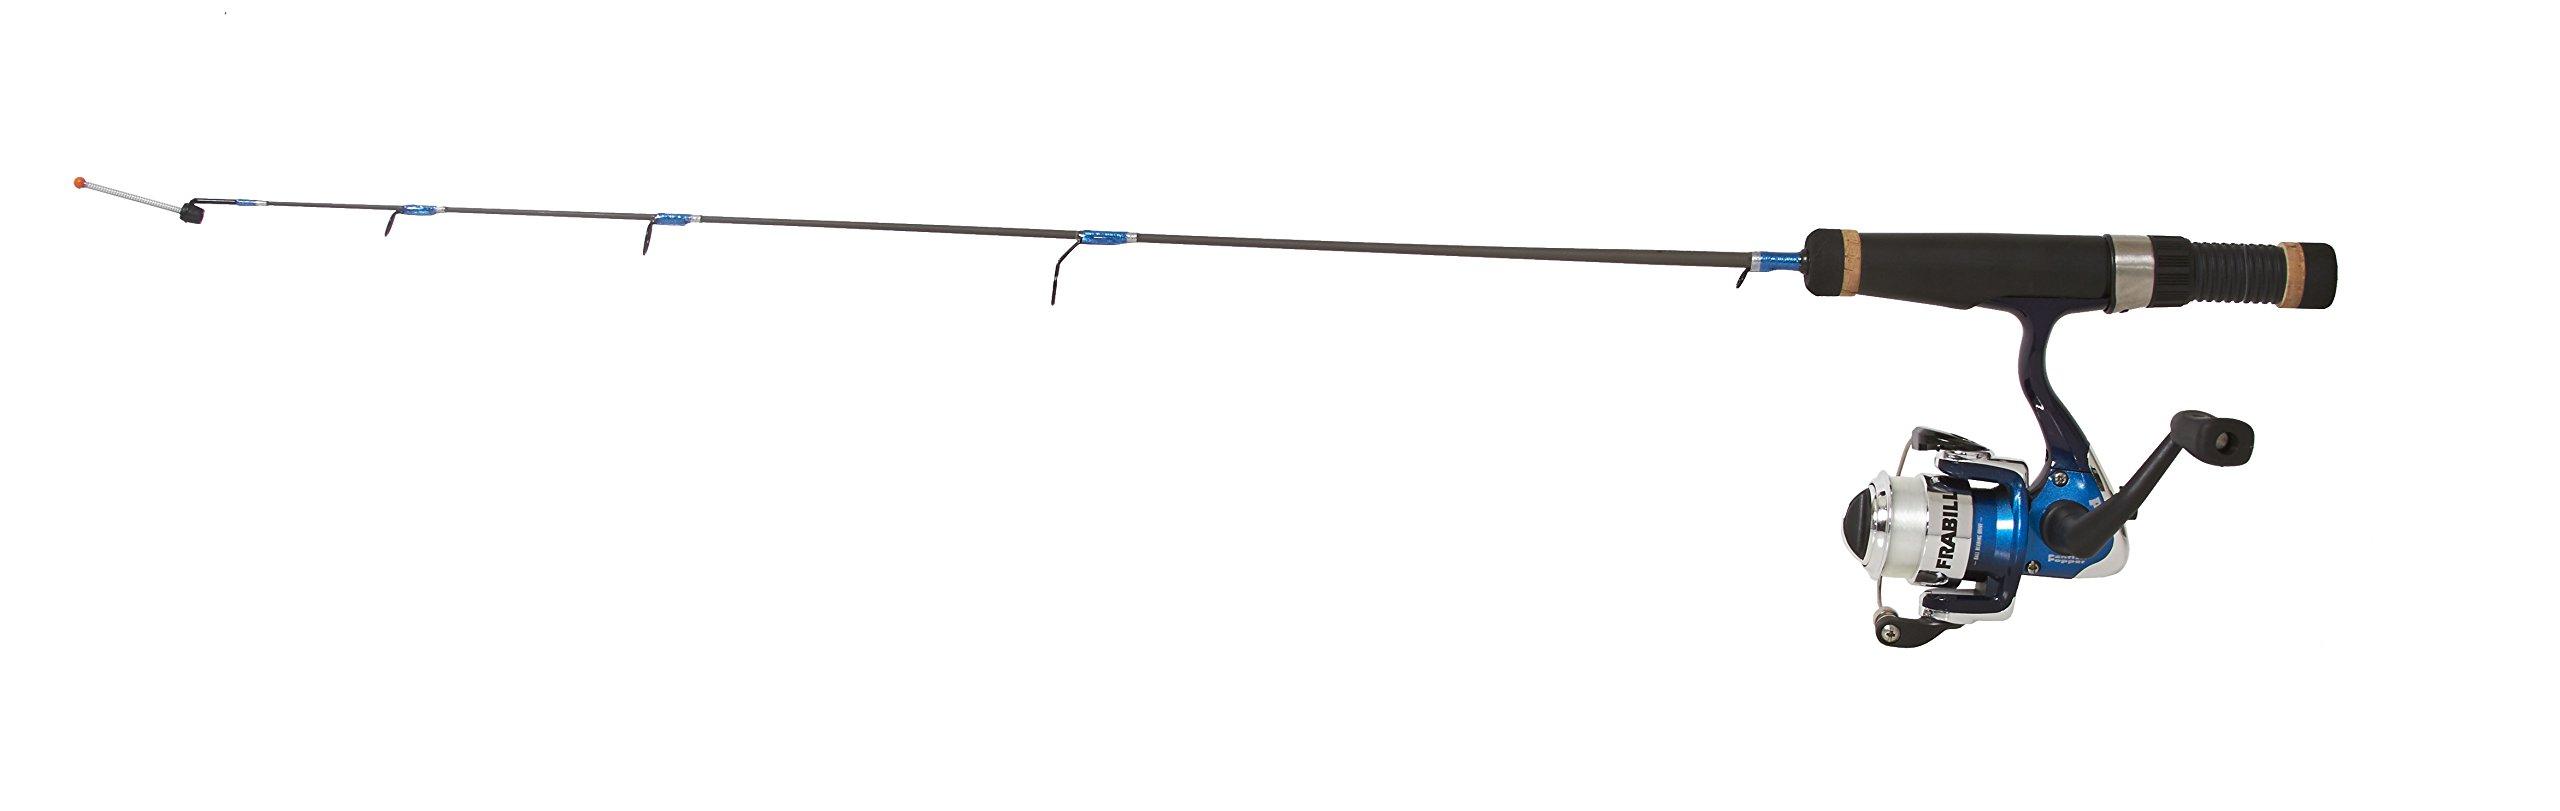 Frabill Panfish Popper Pro 30-Inch Dead Stick, Black